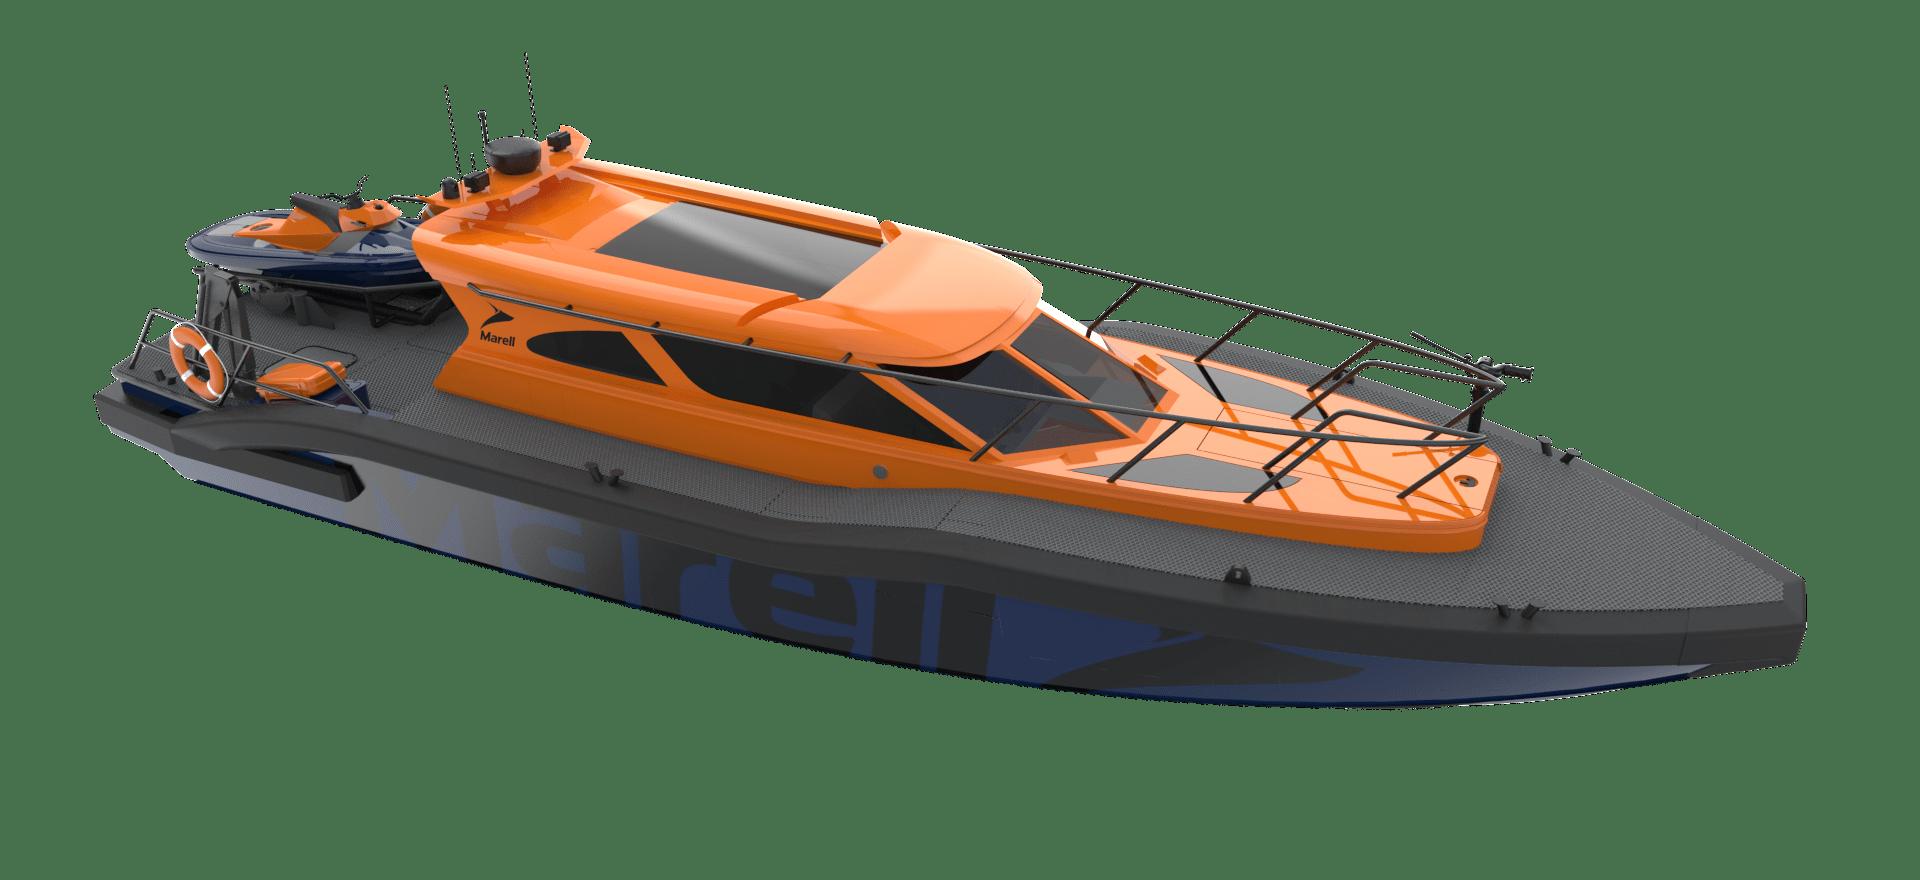 M17 SAR rendered boat model